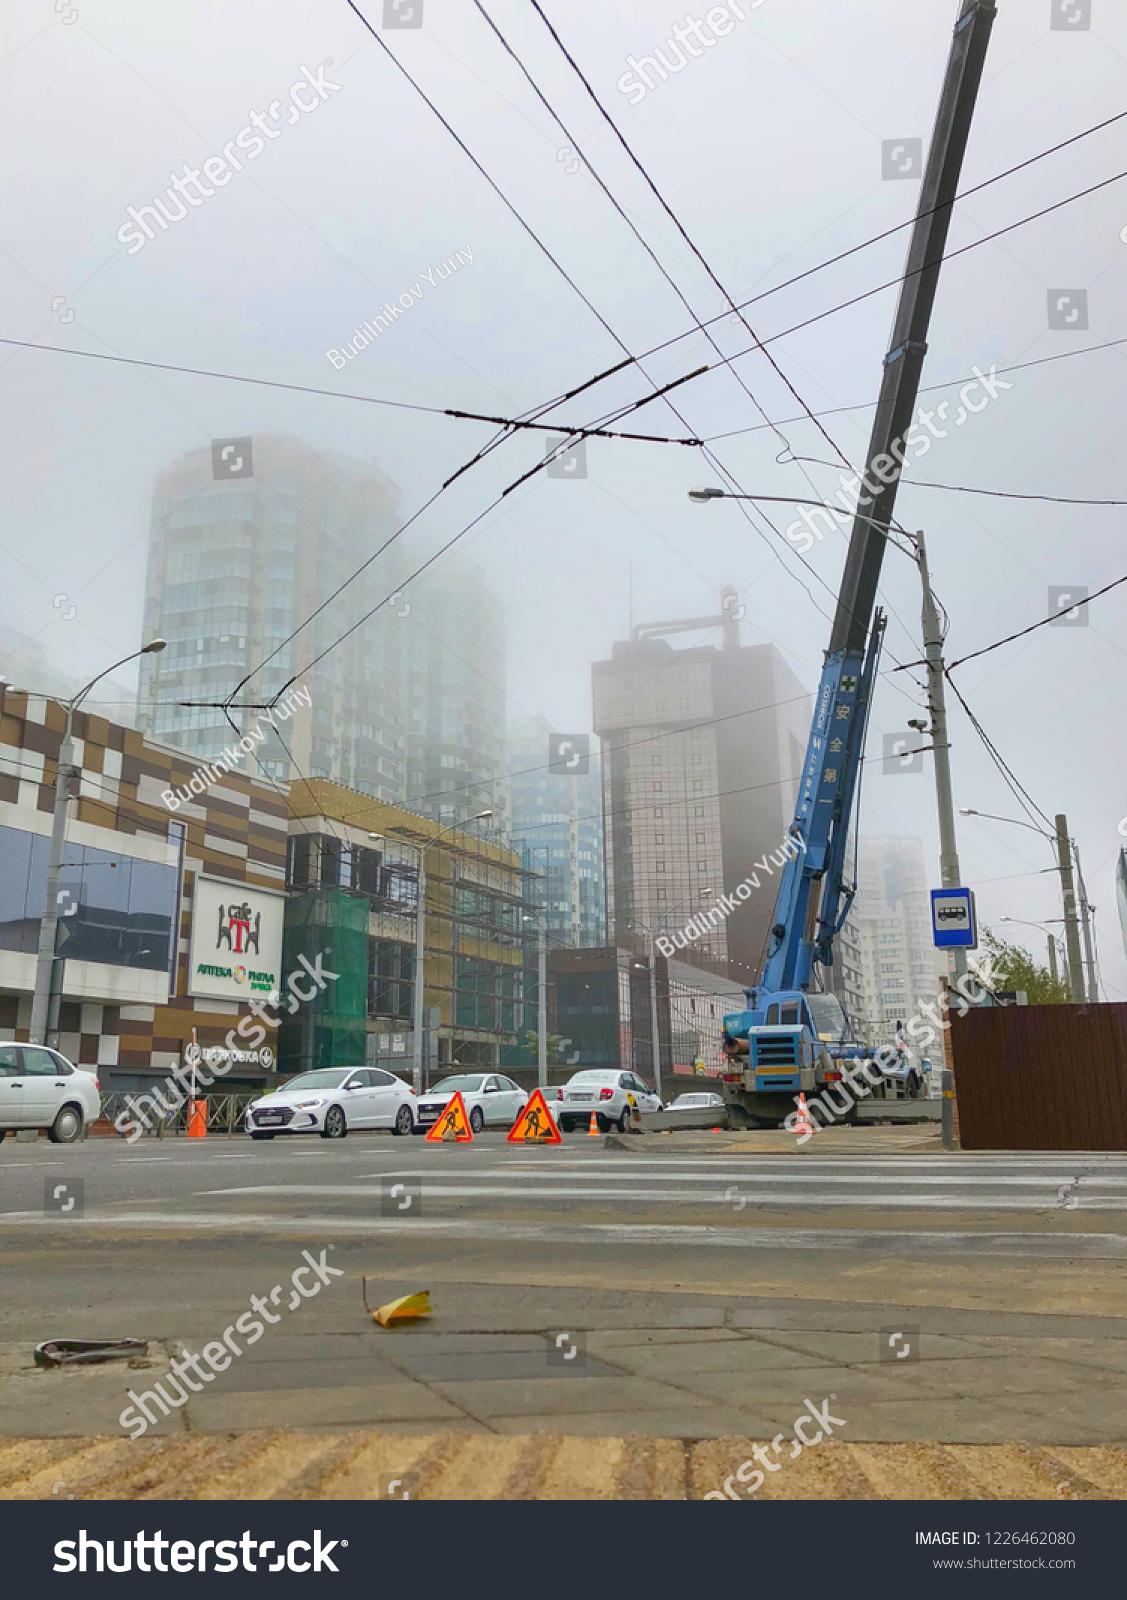 Krasnodar Russia Nowember 10 2018 Street Stock Photo Edit Now 1226462080